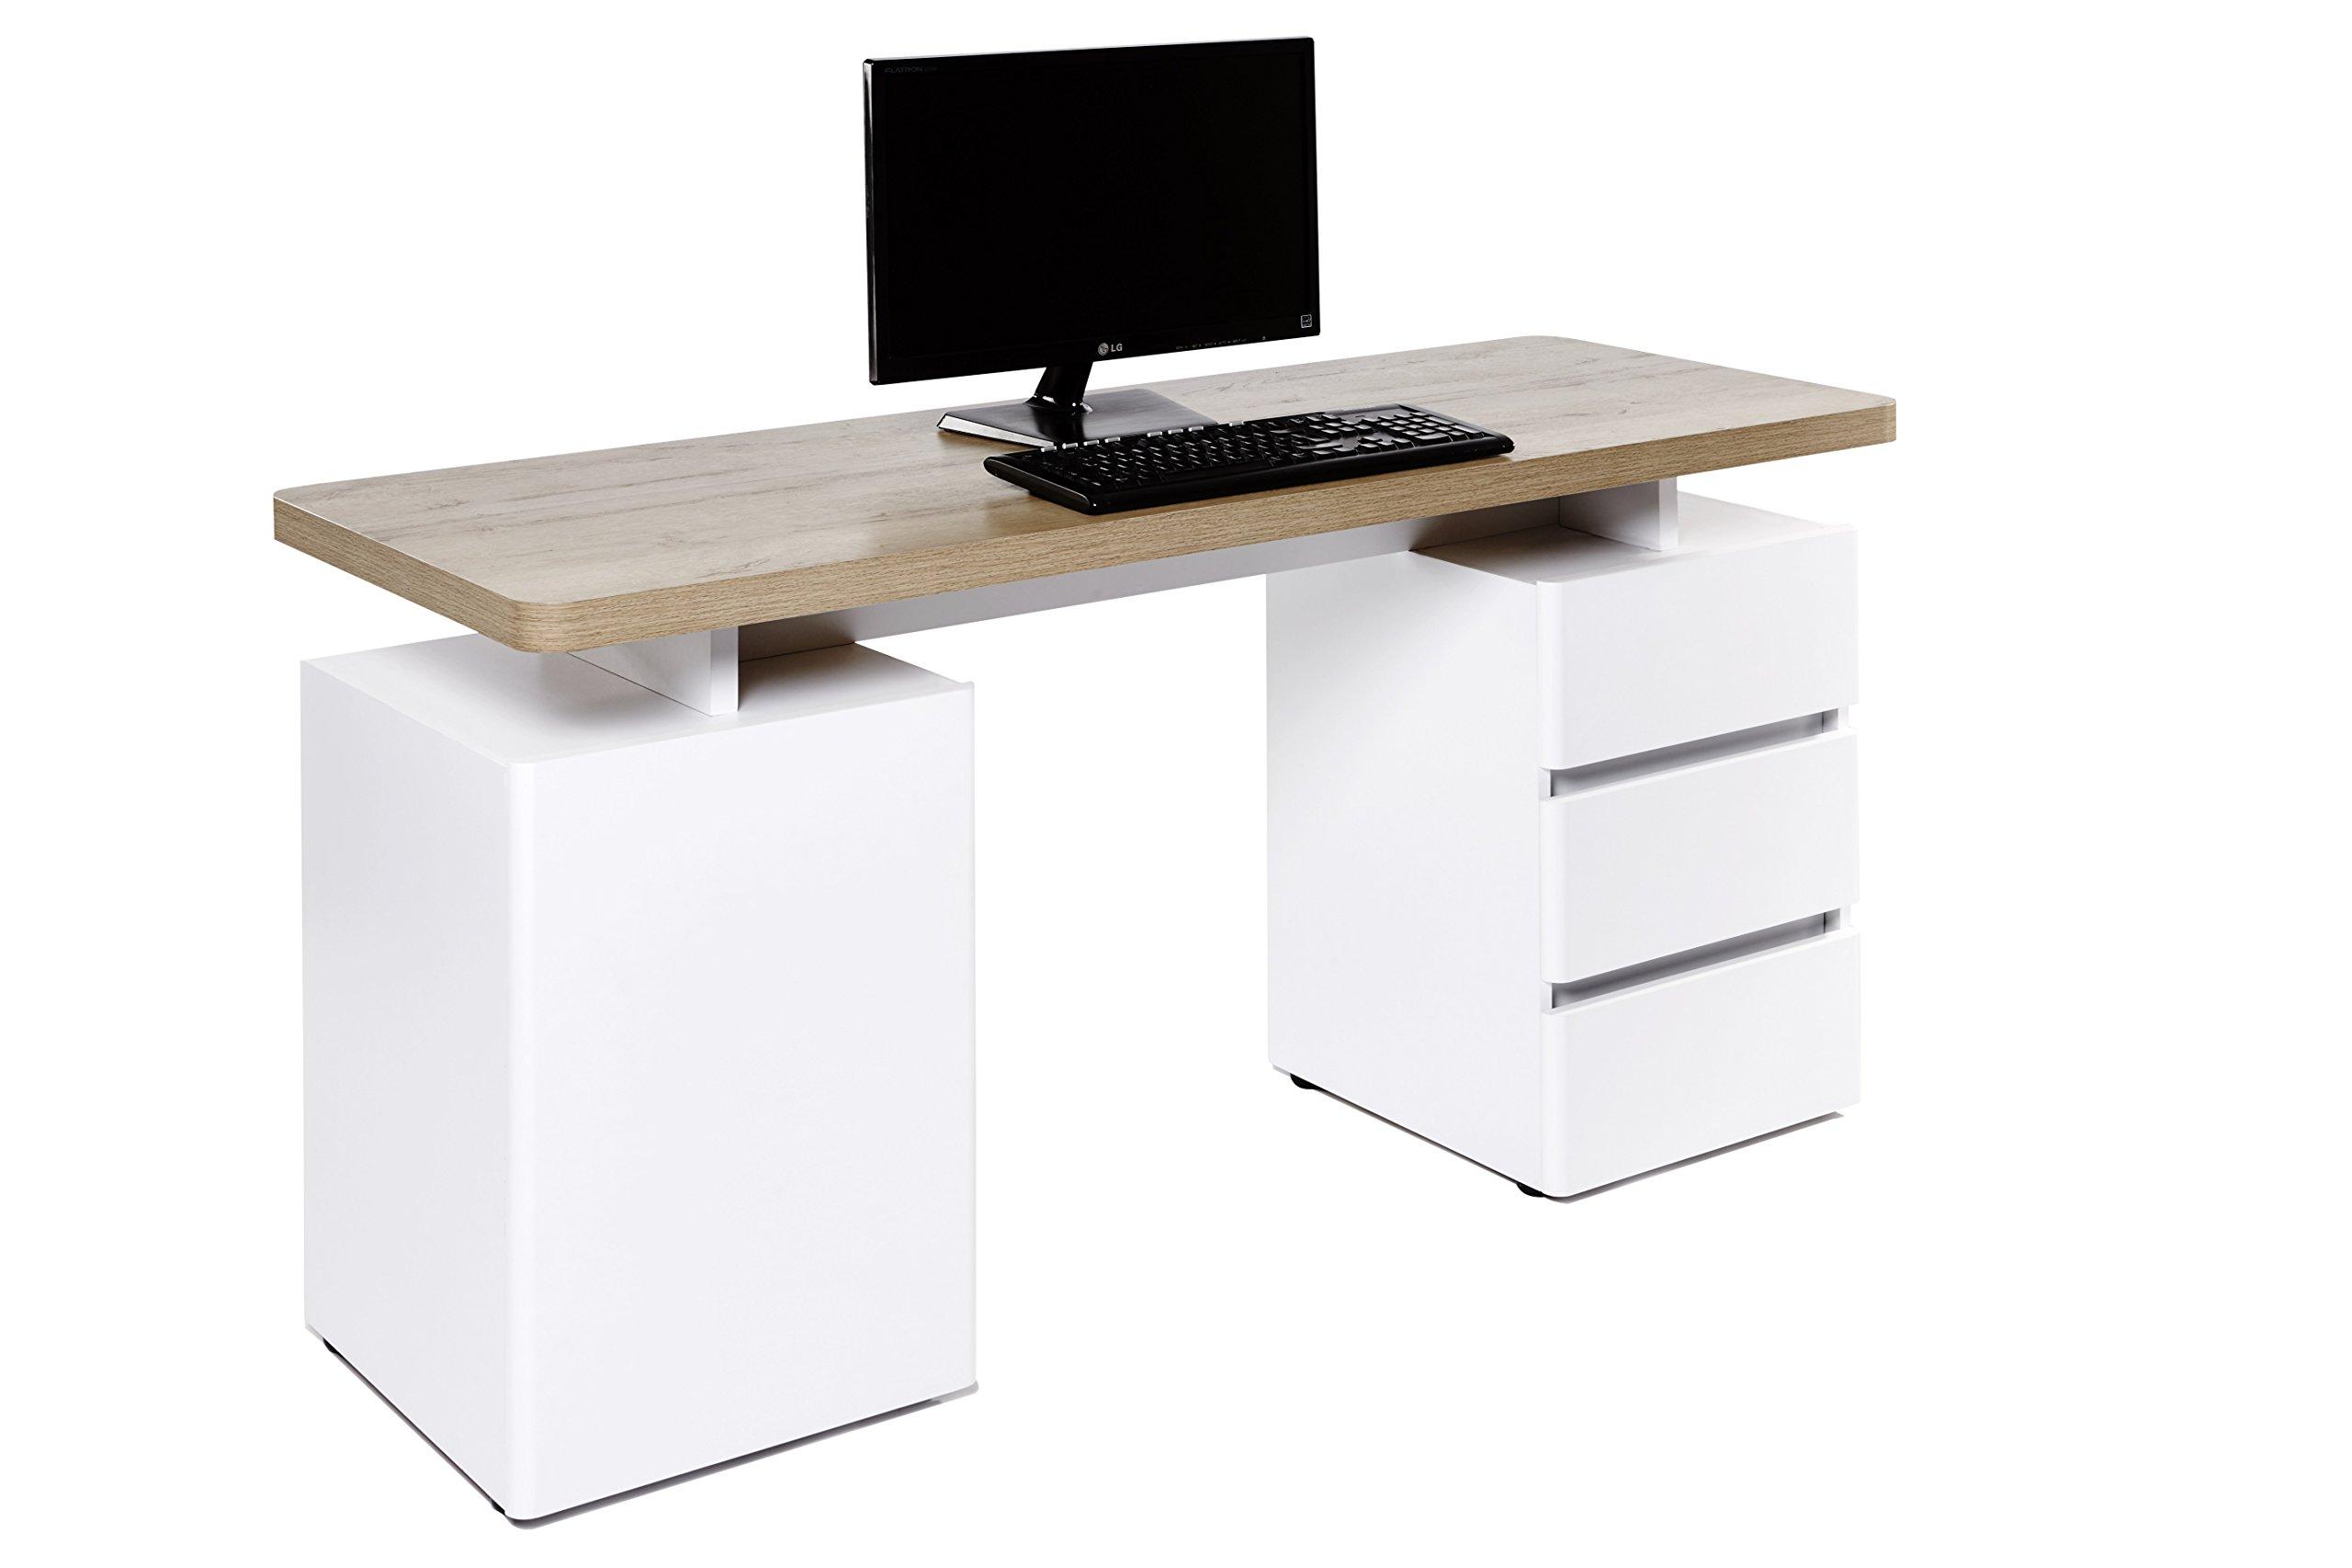 Amazon Brand -Movian Skadar 1-Door 3-Drawer Desk, 150 x 55 x 76cm, White/Light Brown Oak-Effect Top